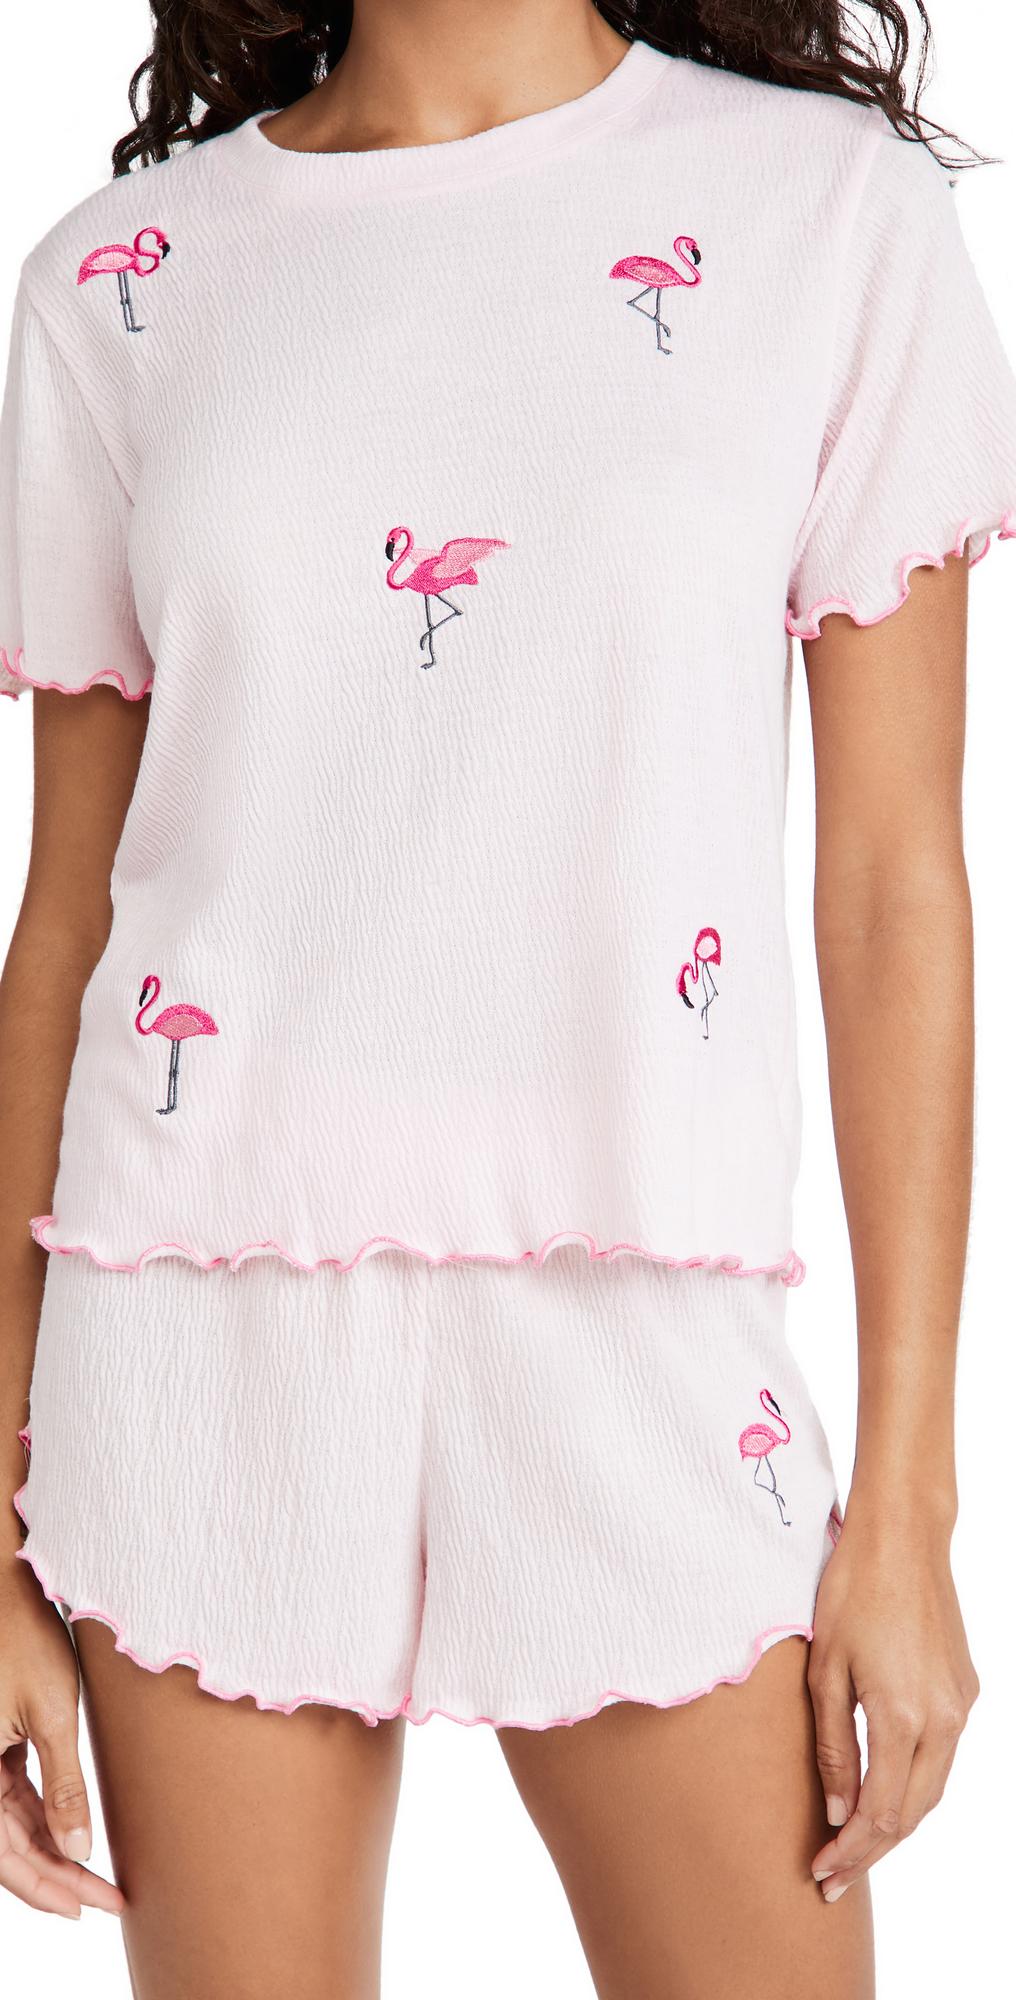 Tee & Shorts Pajama Set